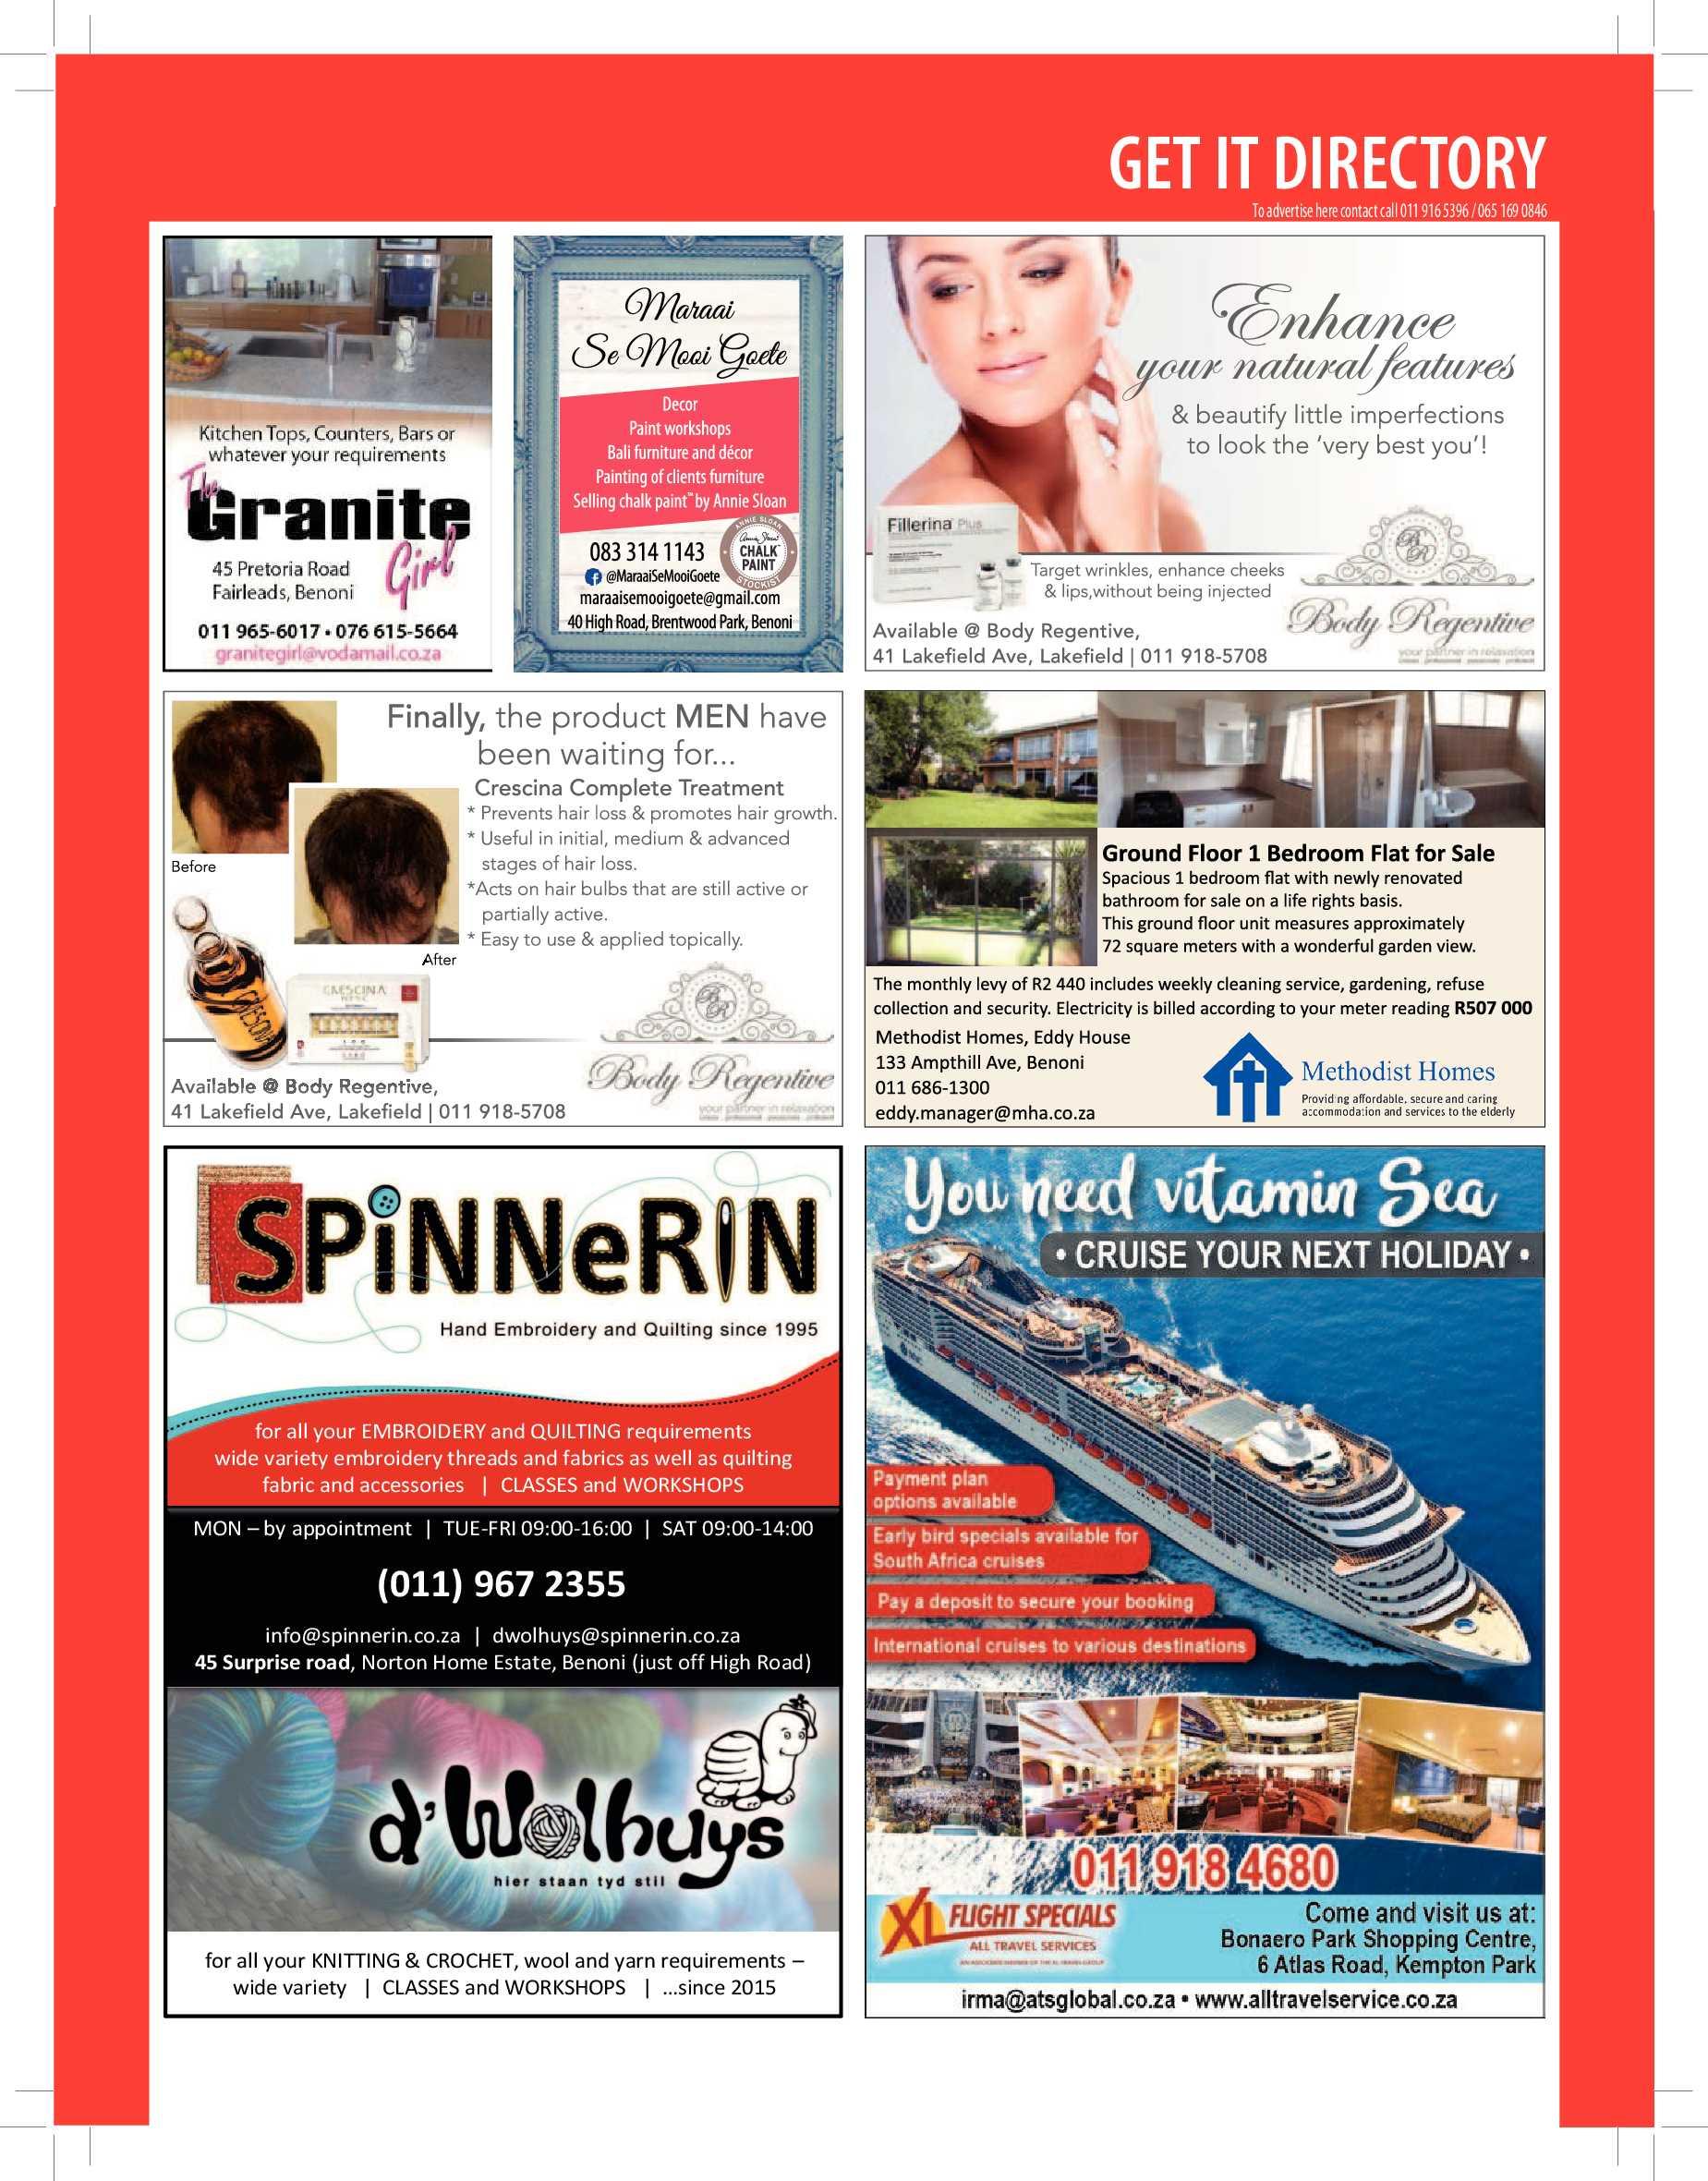 get-east-june-2018-epapers-page-33